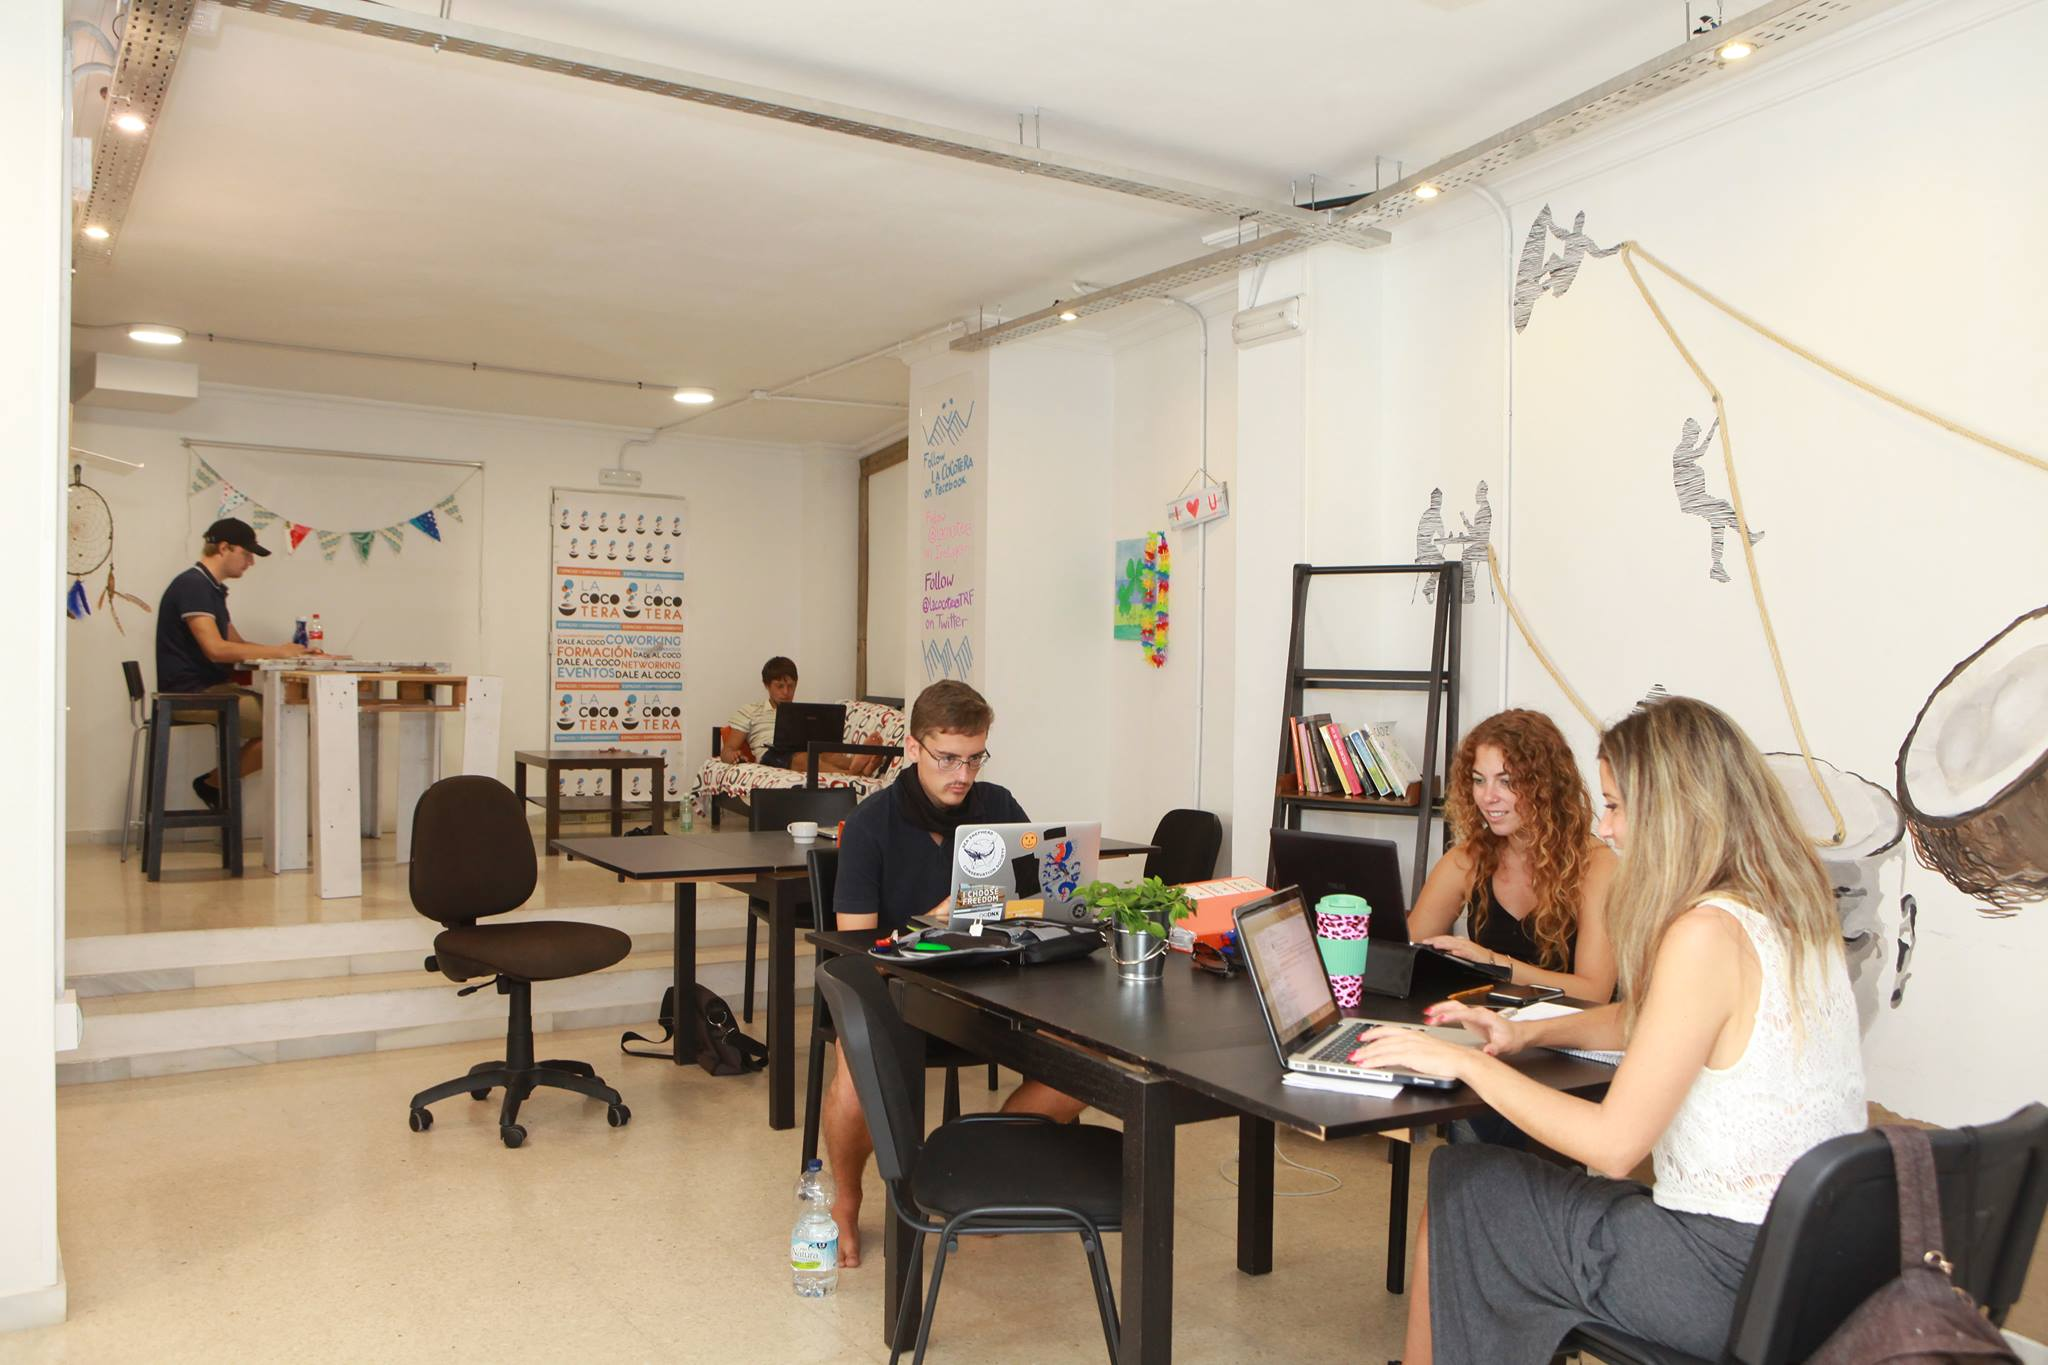 Hoteles con coworking en España